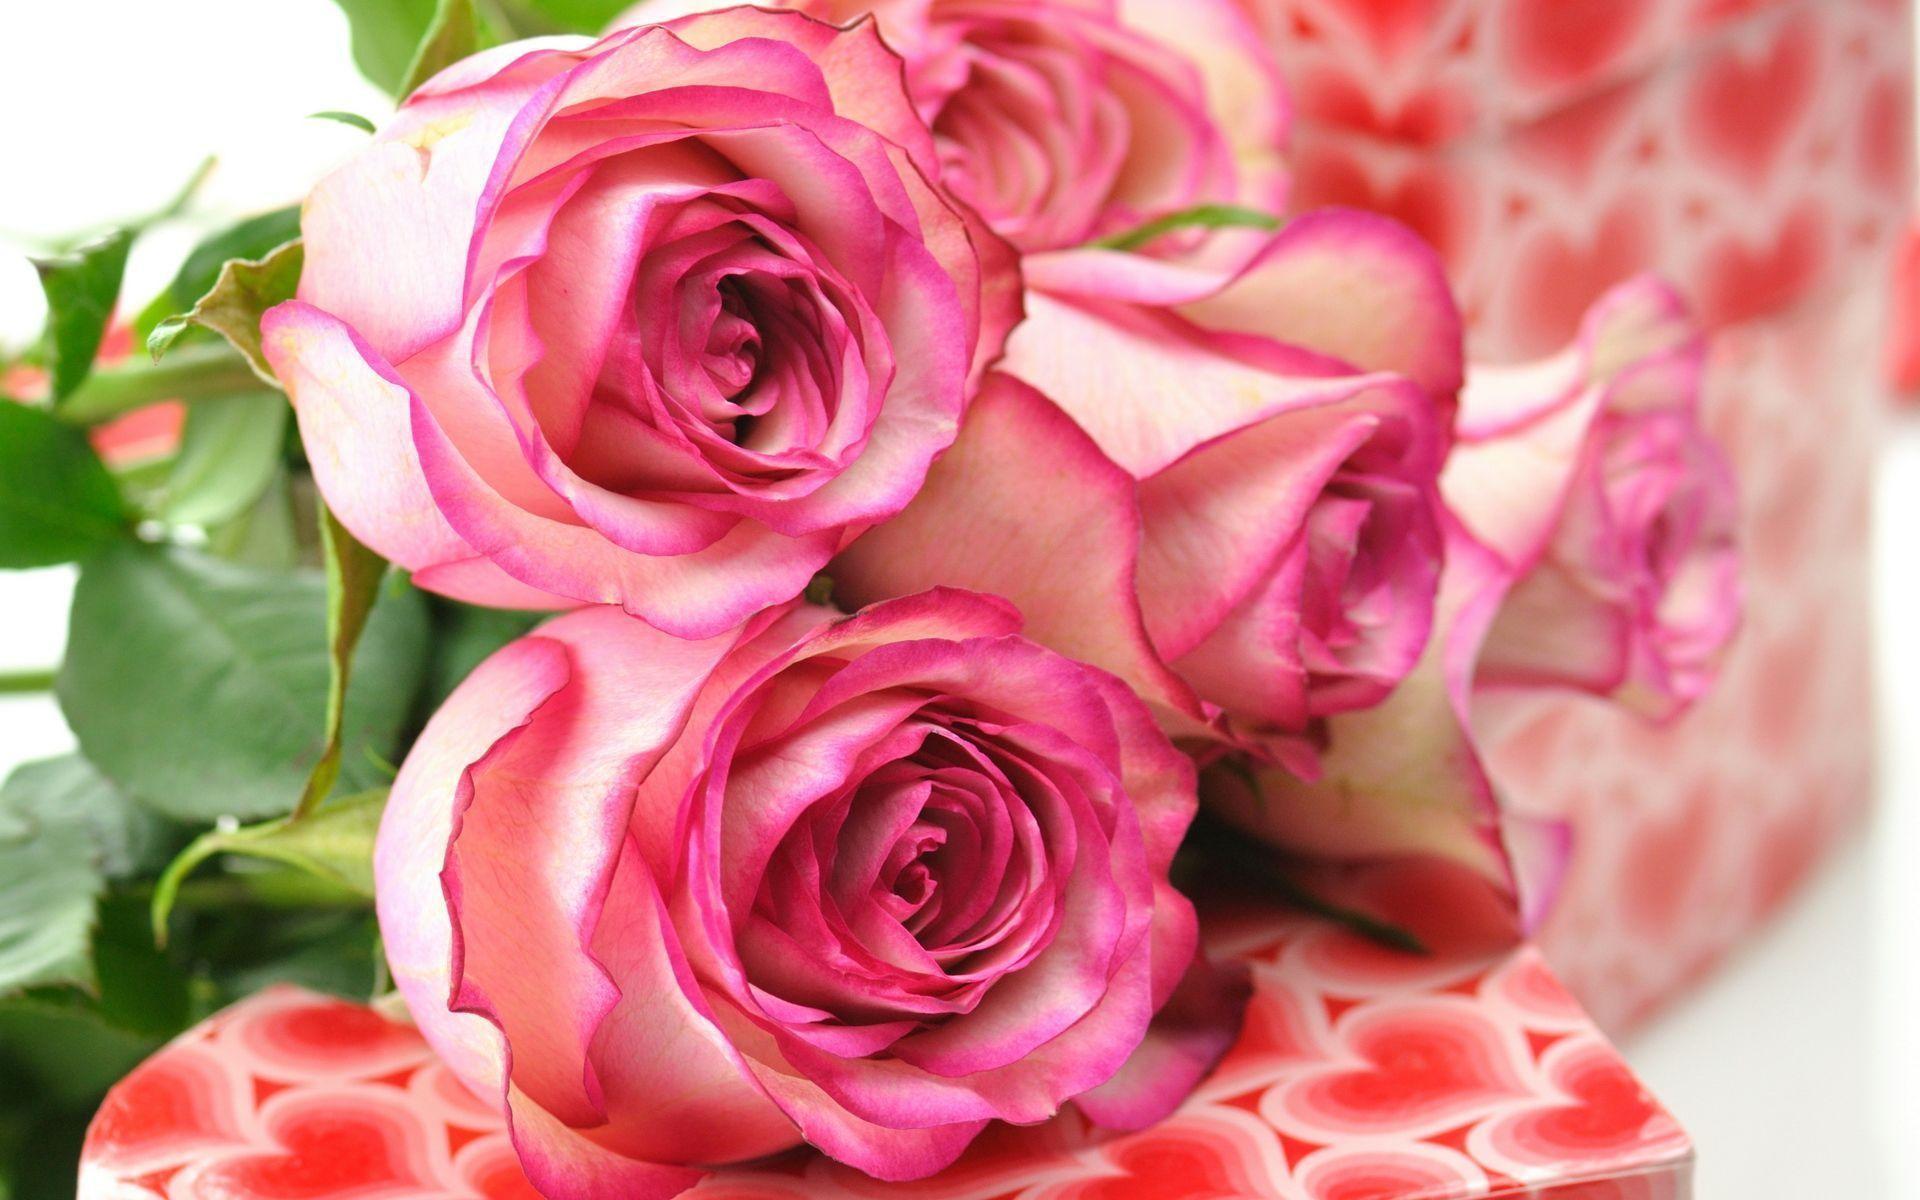 Beautiful Roses Wallpapers For Desktop Hd Cool 7 HD Wallpapers .